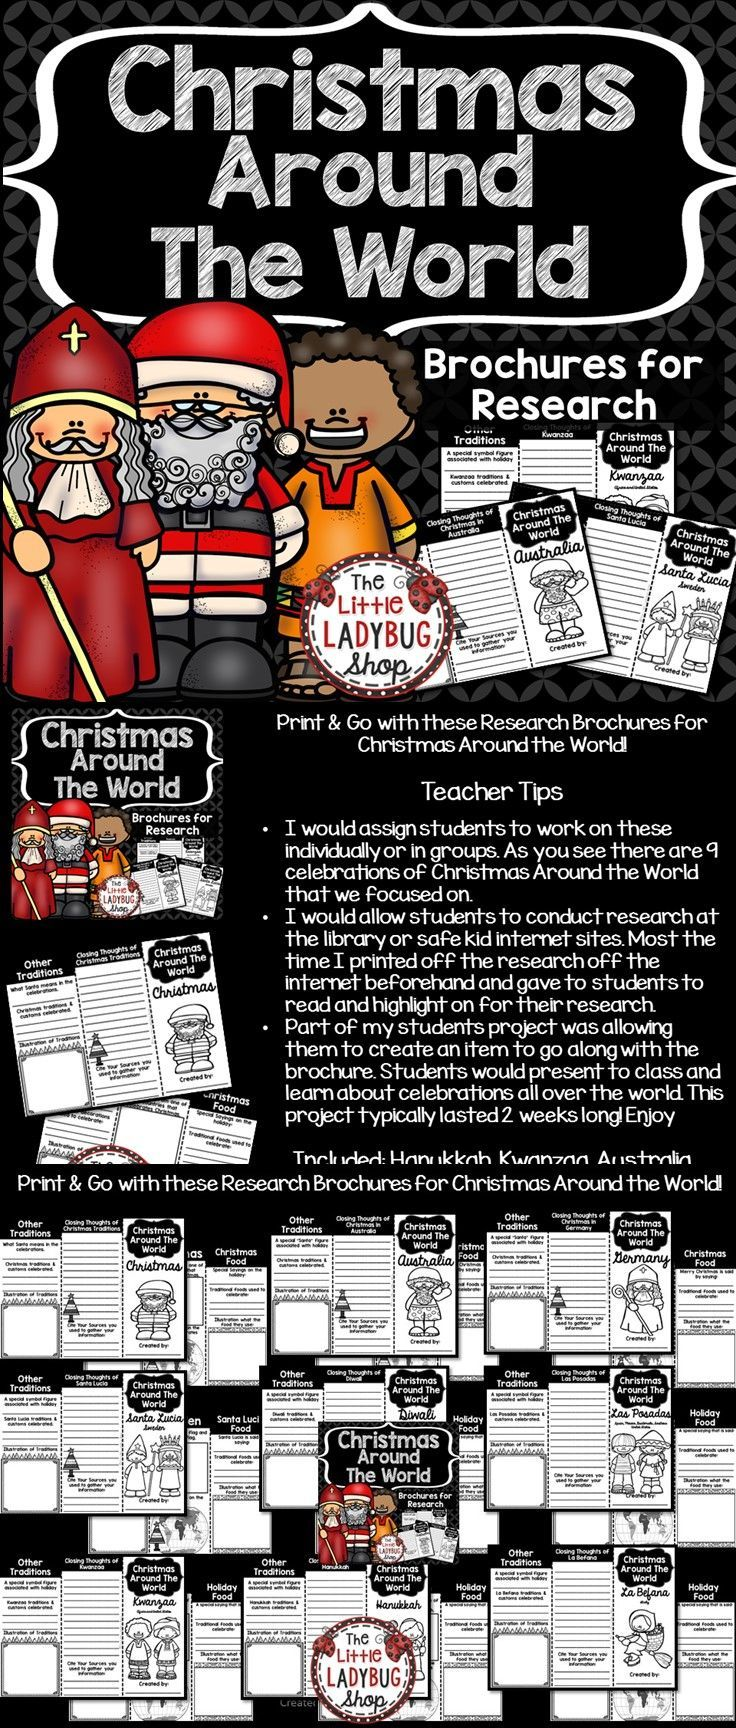 ★★ Christmas Around the World Brochures.★★ Print & Go with these Research Brochures for Christmas Around the World!